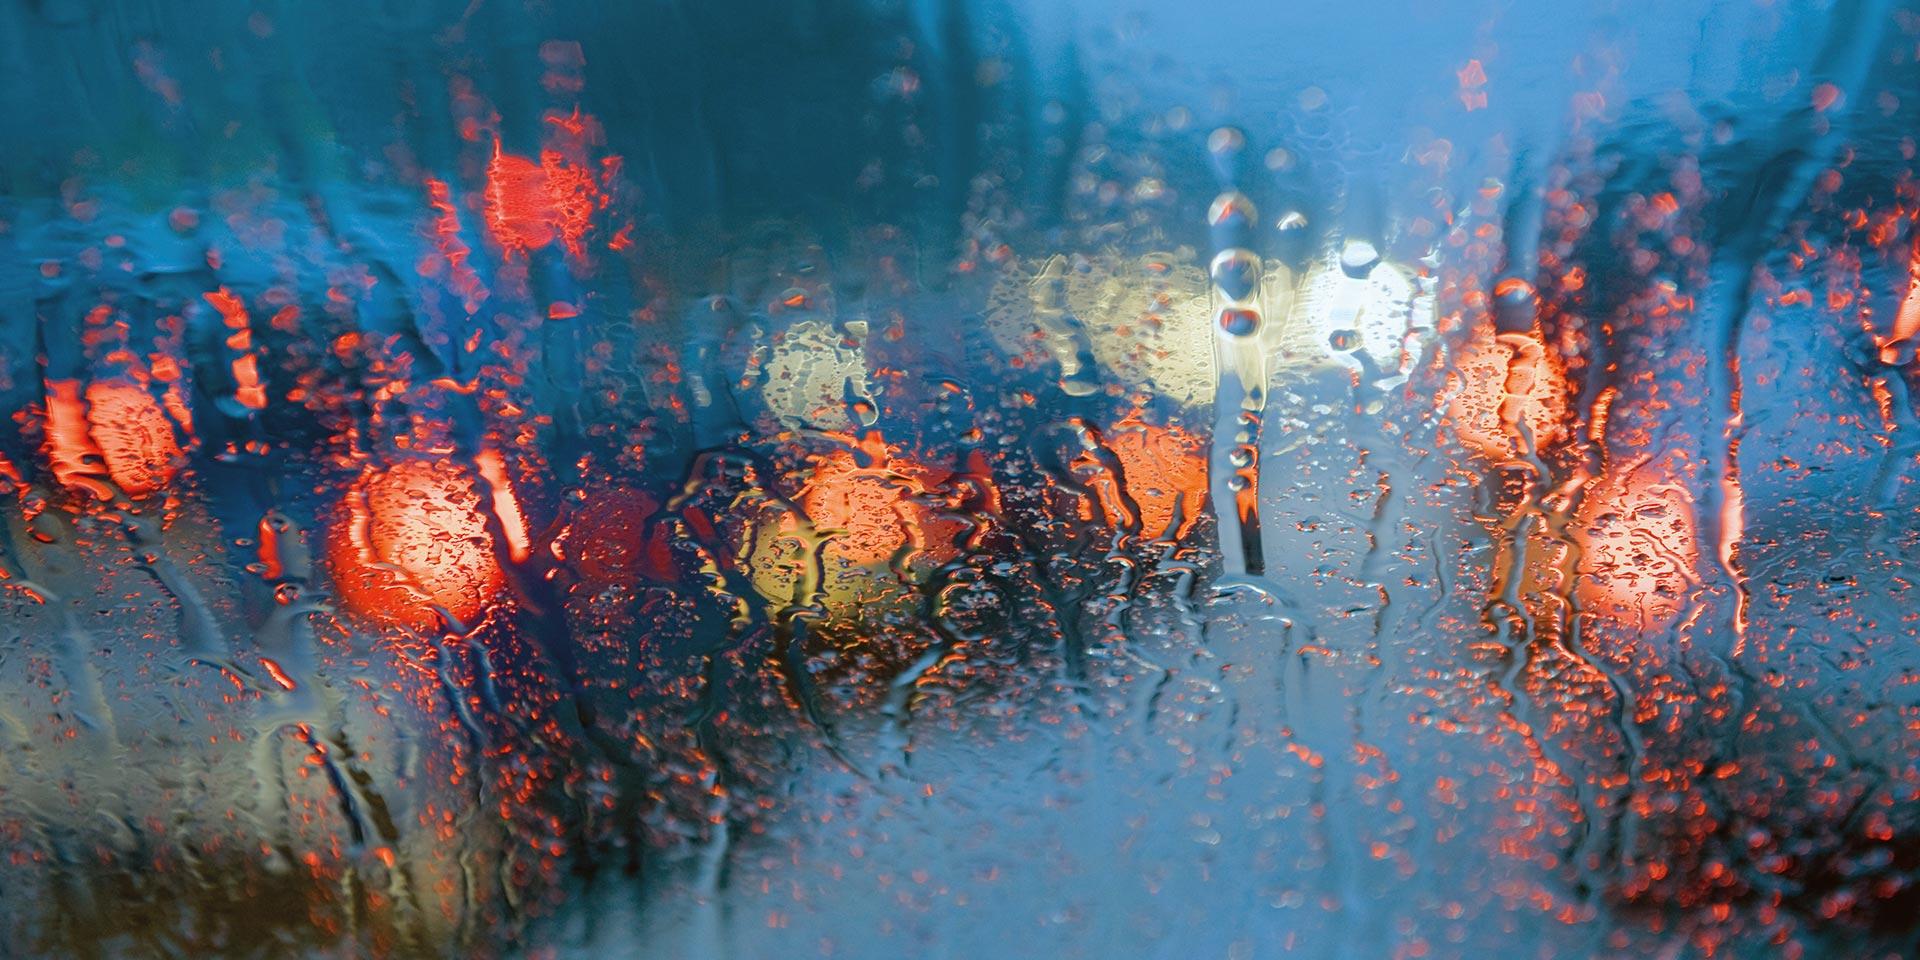 Rain on wind shield